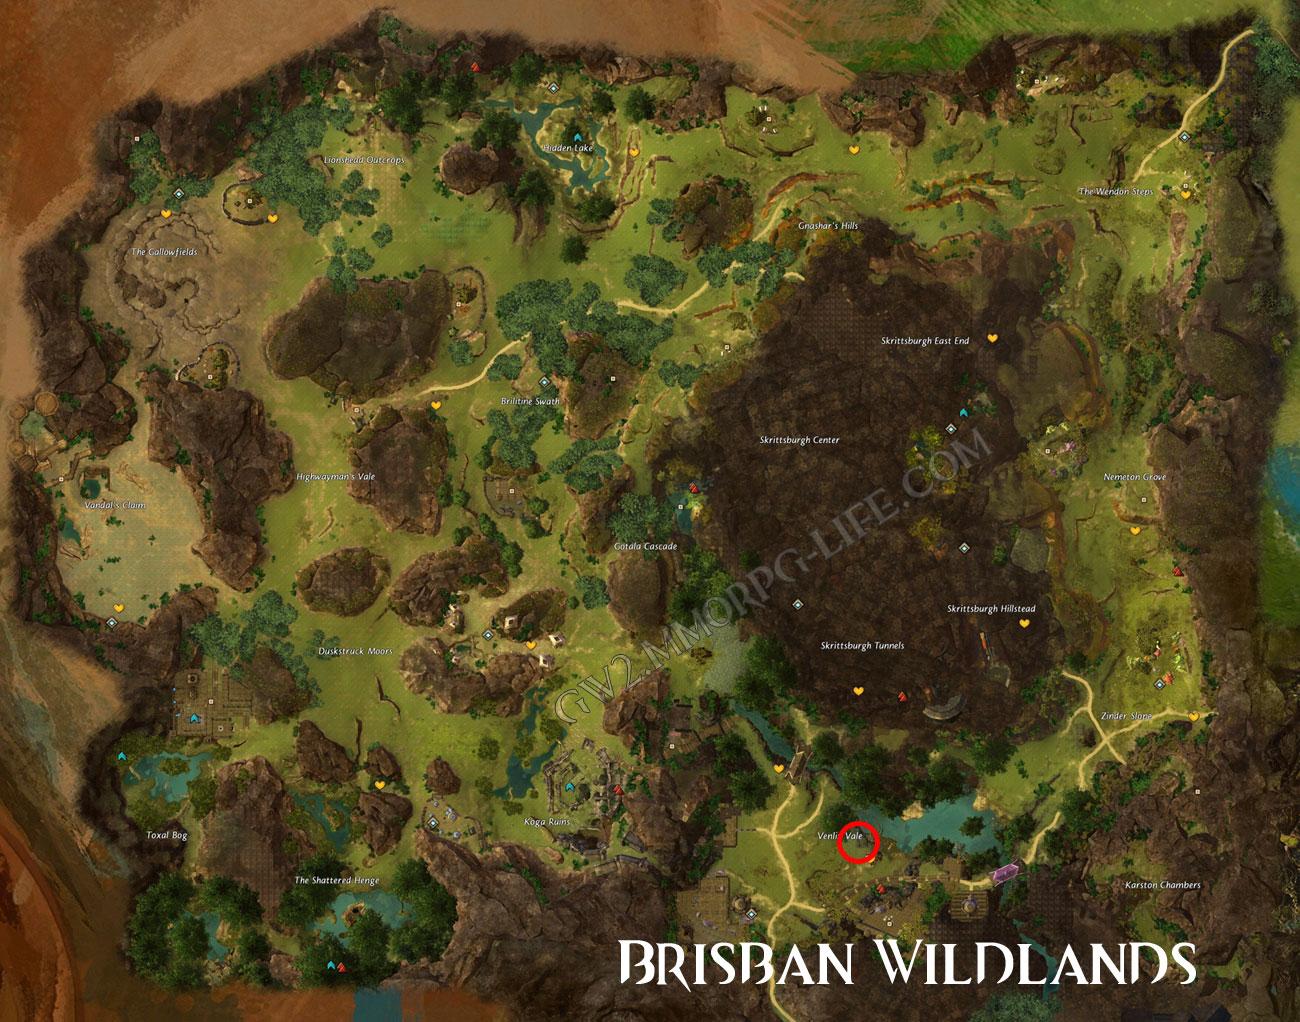 juvenile_flamingo_Brisban_Wildlands_gw2_map_location